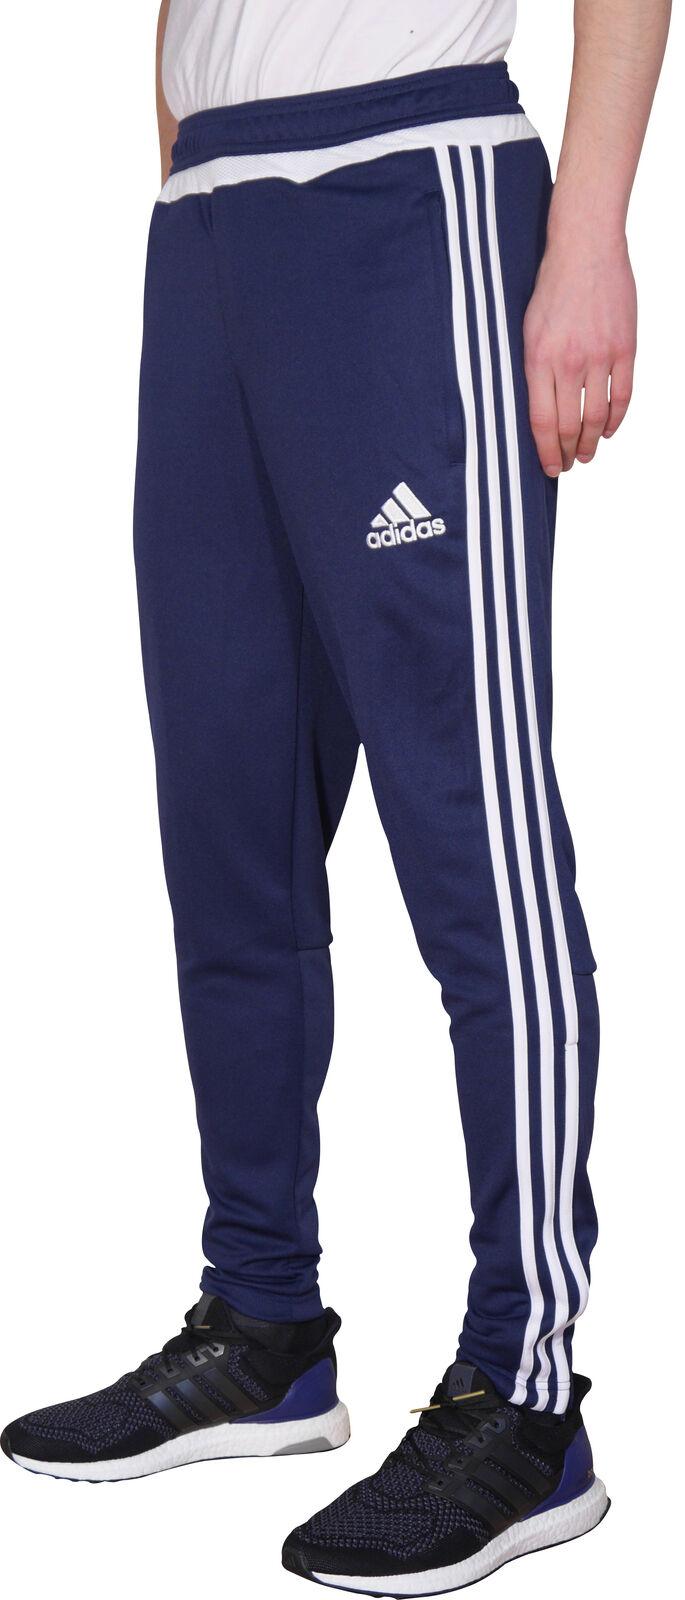 Adidas Tiro15 Mens Skinny Skinnies Football Slim Taperot Training Pants    Fairer Preis